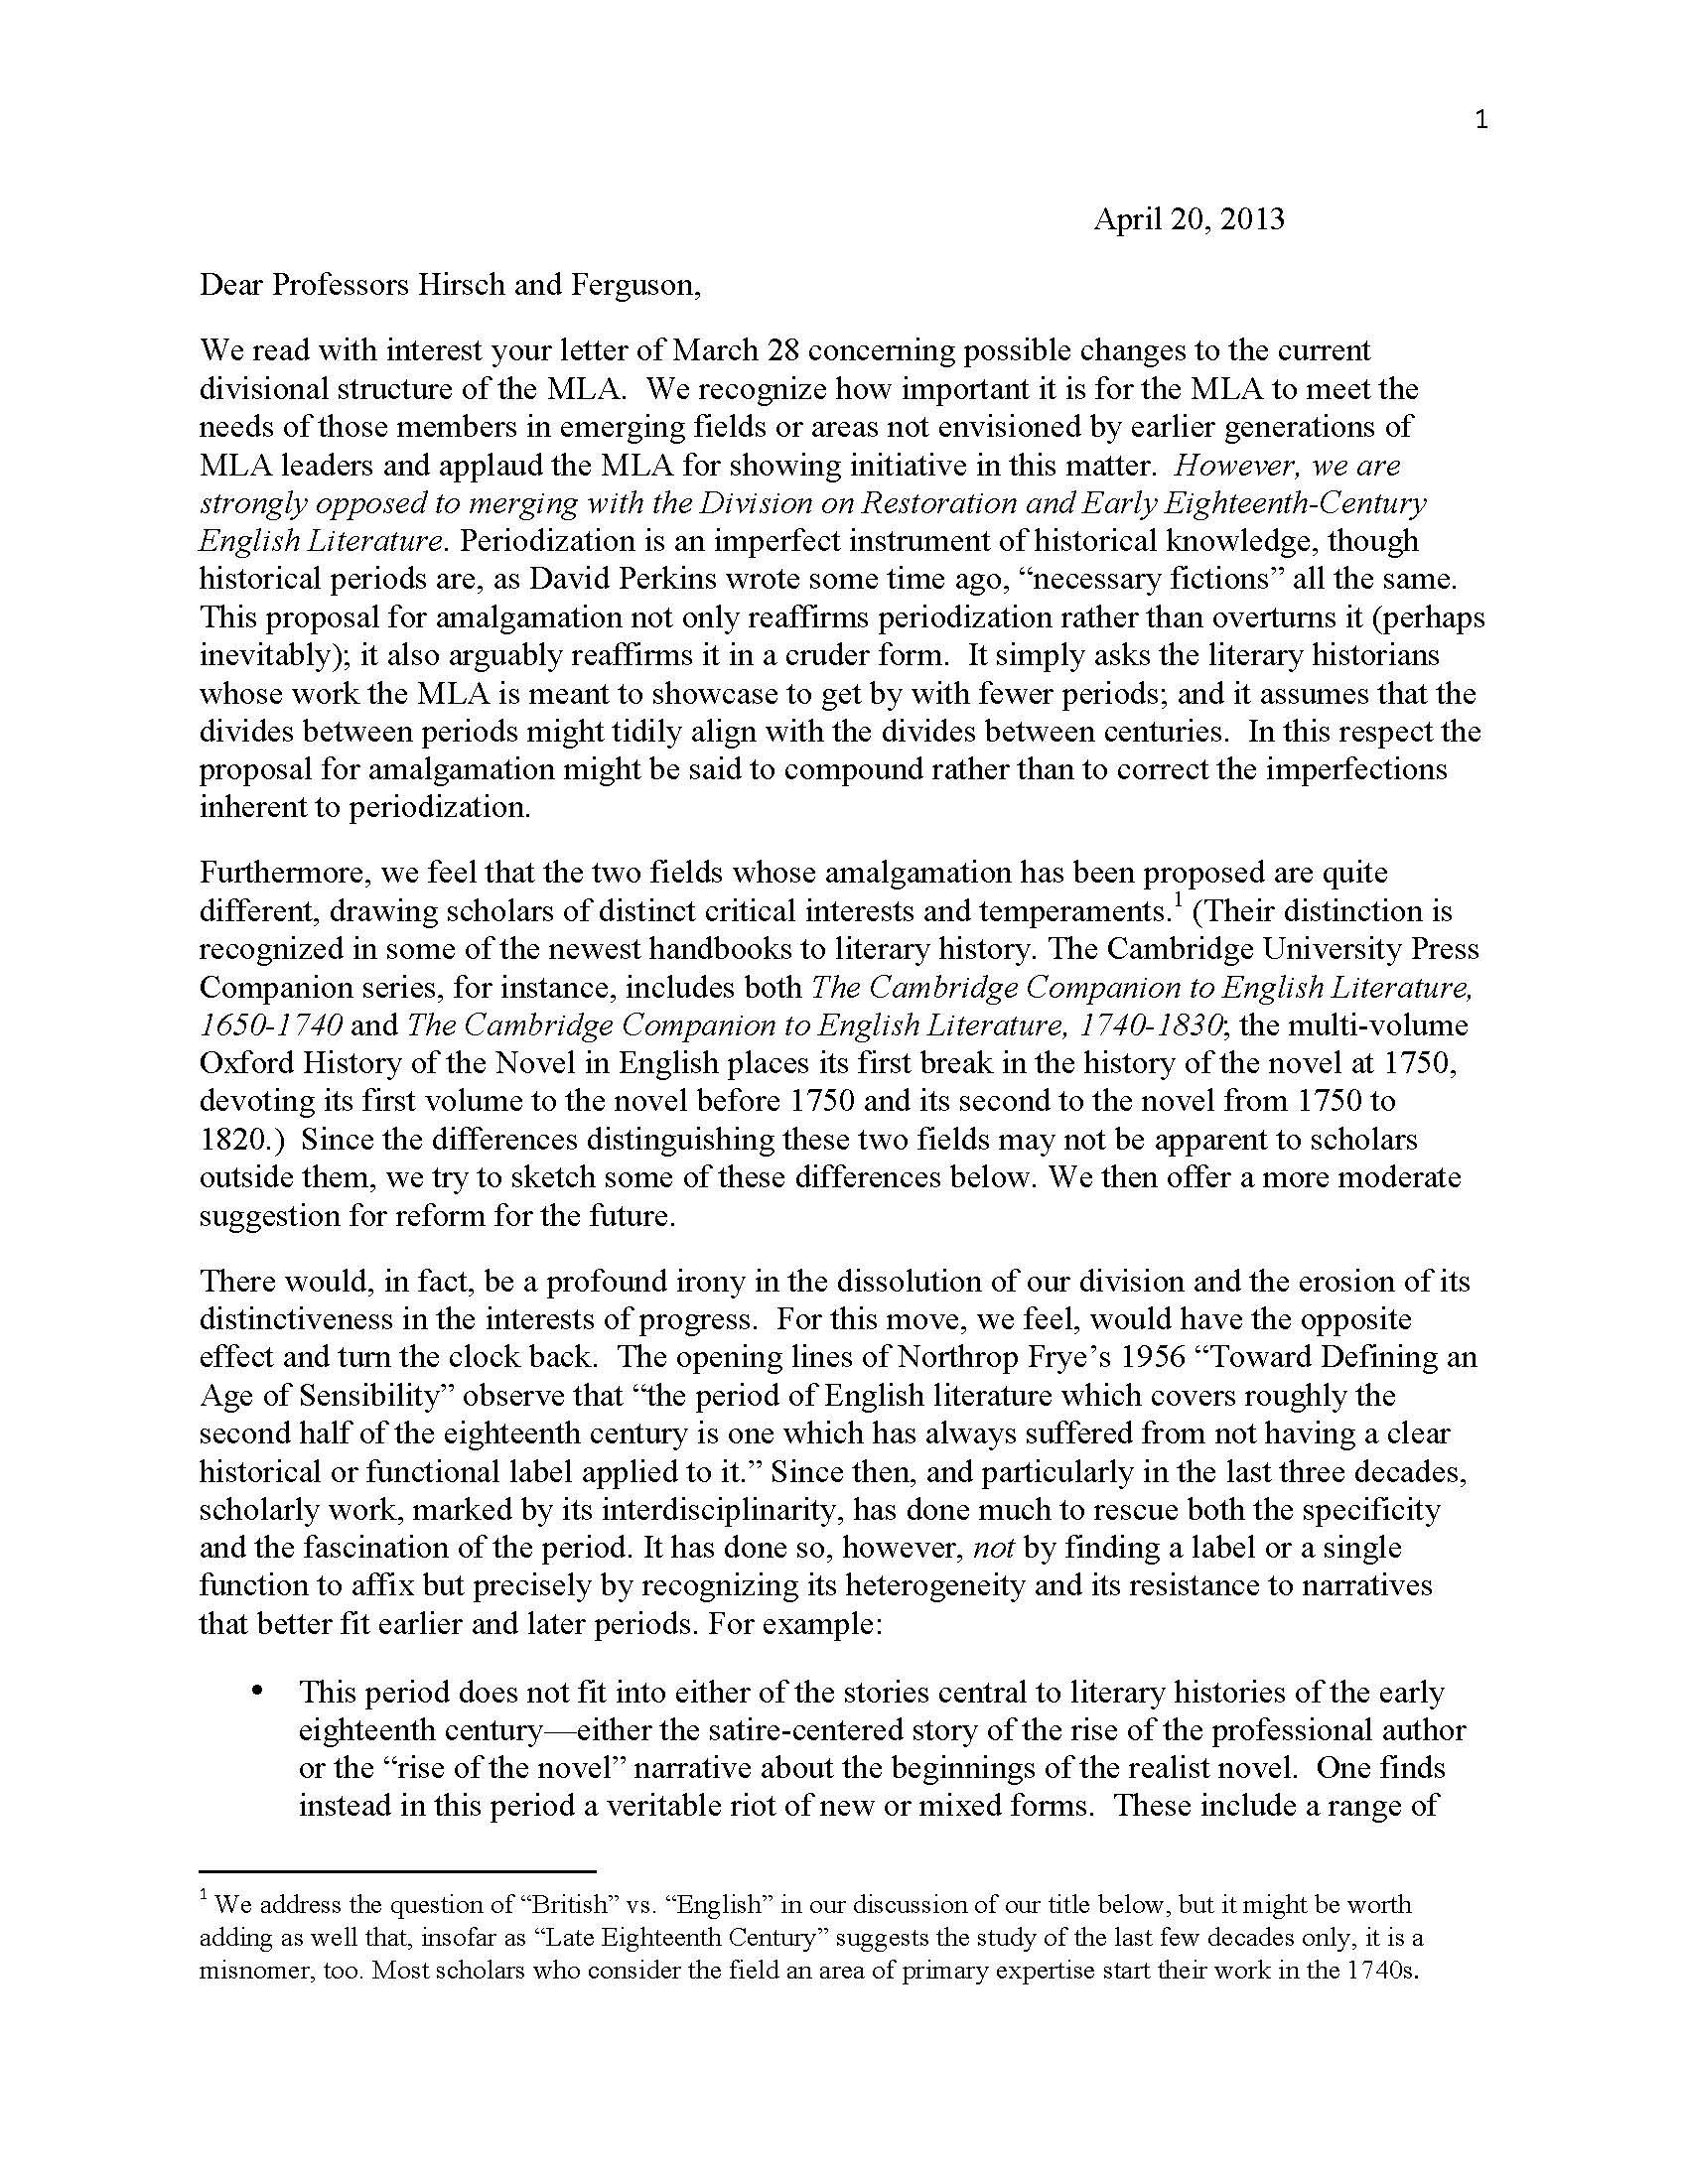 016 Response To Marianne Hirsch Margaret Ferguson Rev Final Copy Page 1 Free Professional Essays Essay Impressive Full